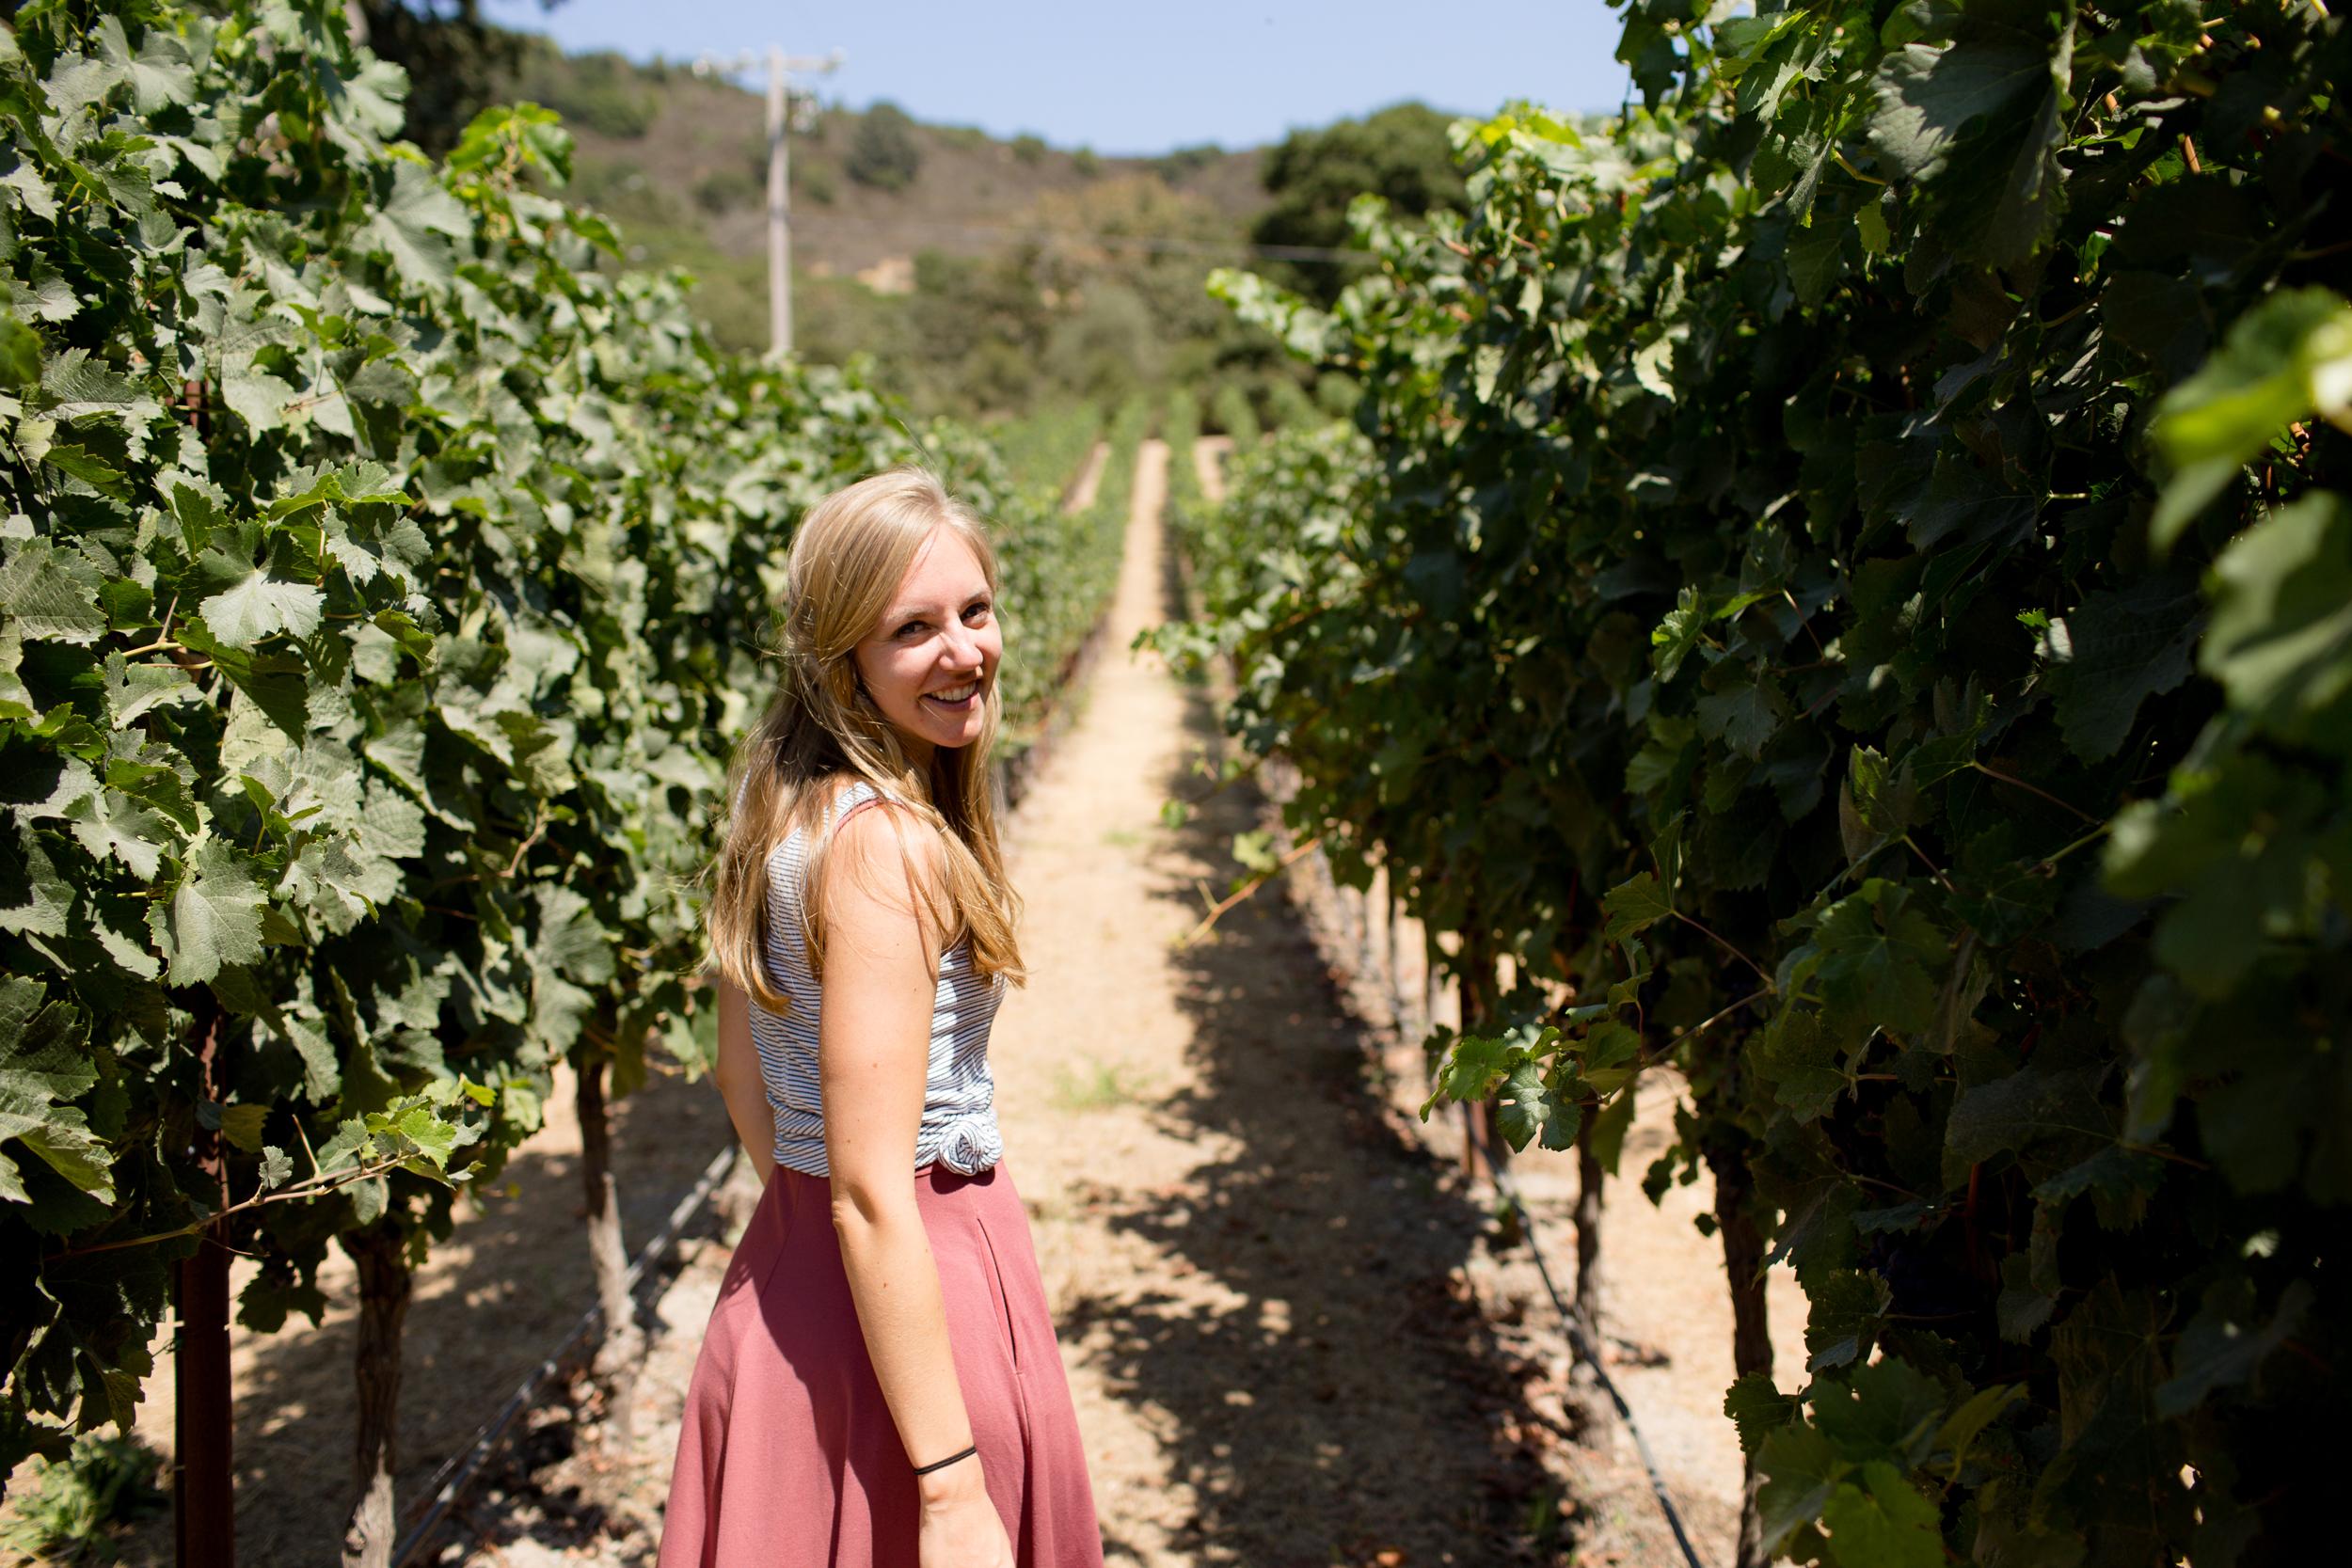 california-travel-photography-anna-mcclellan-photography-5732.jpg